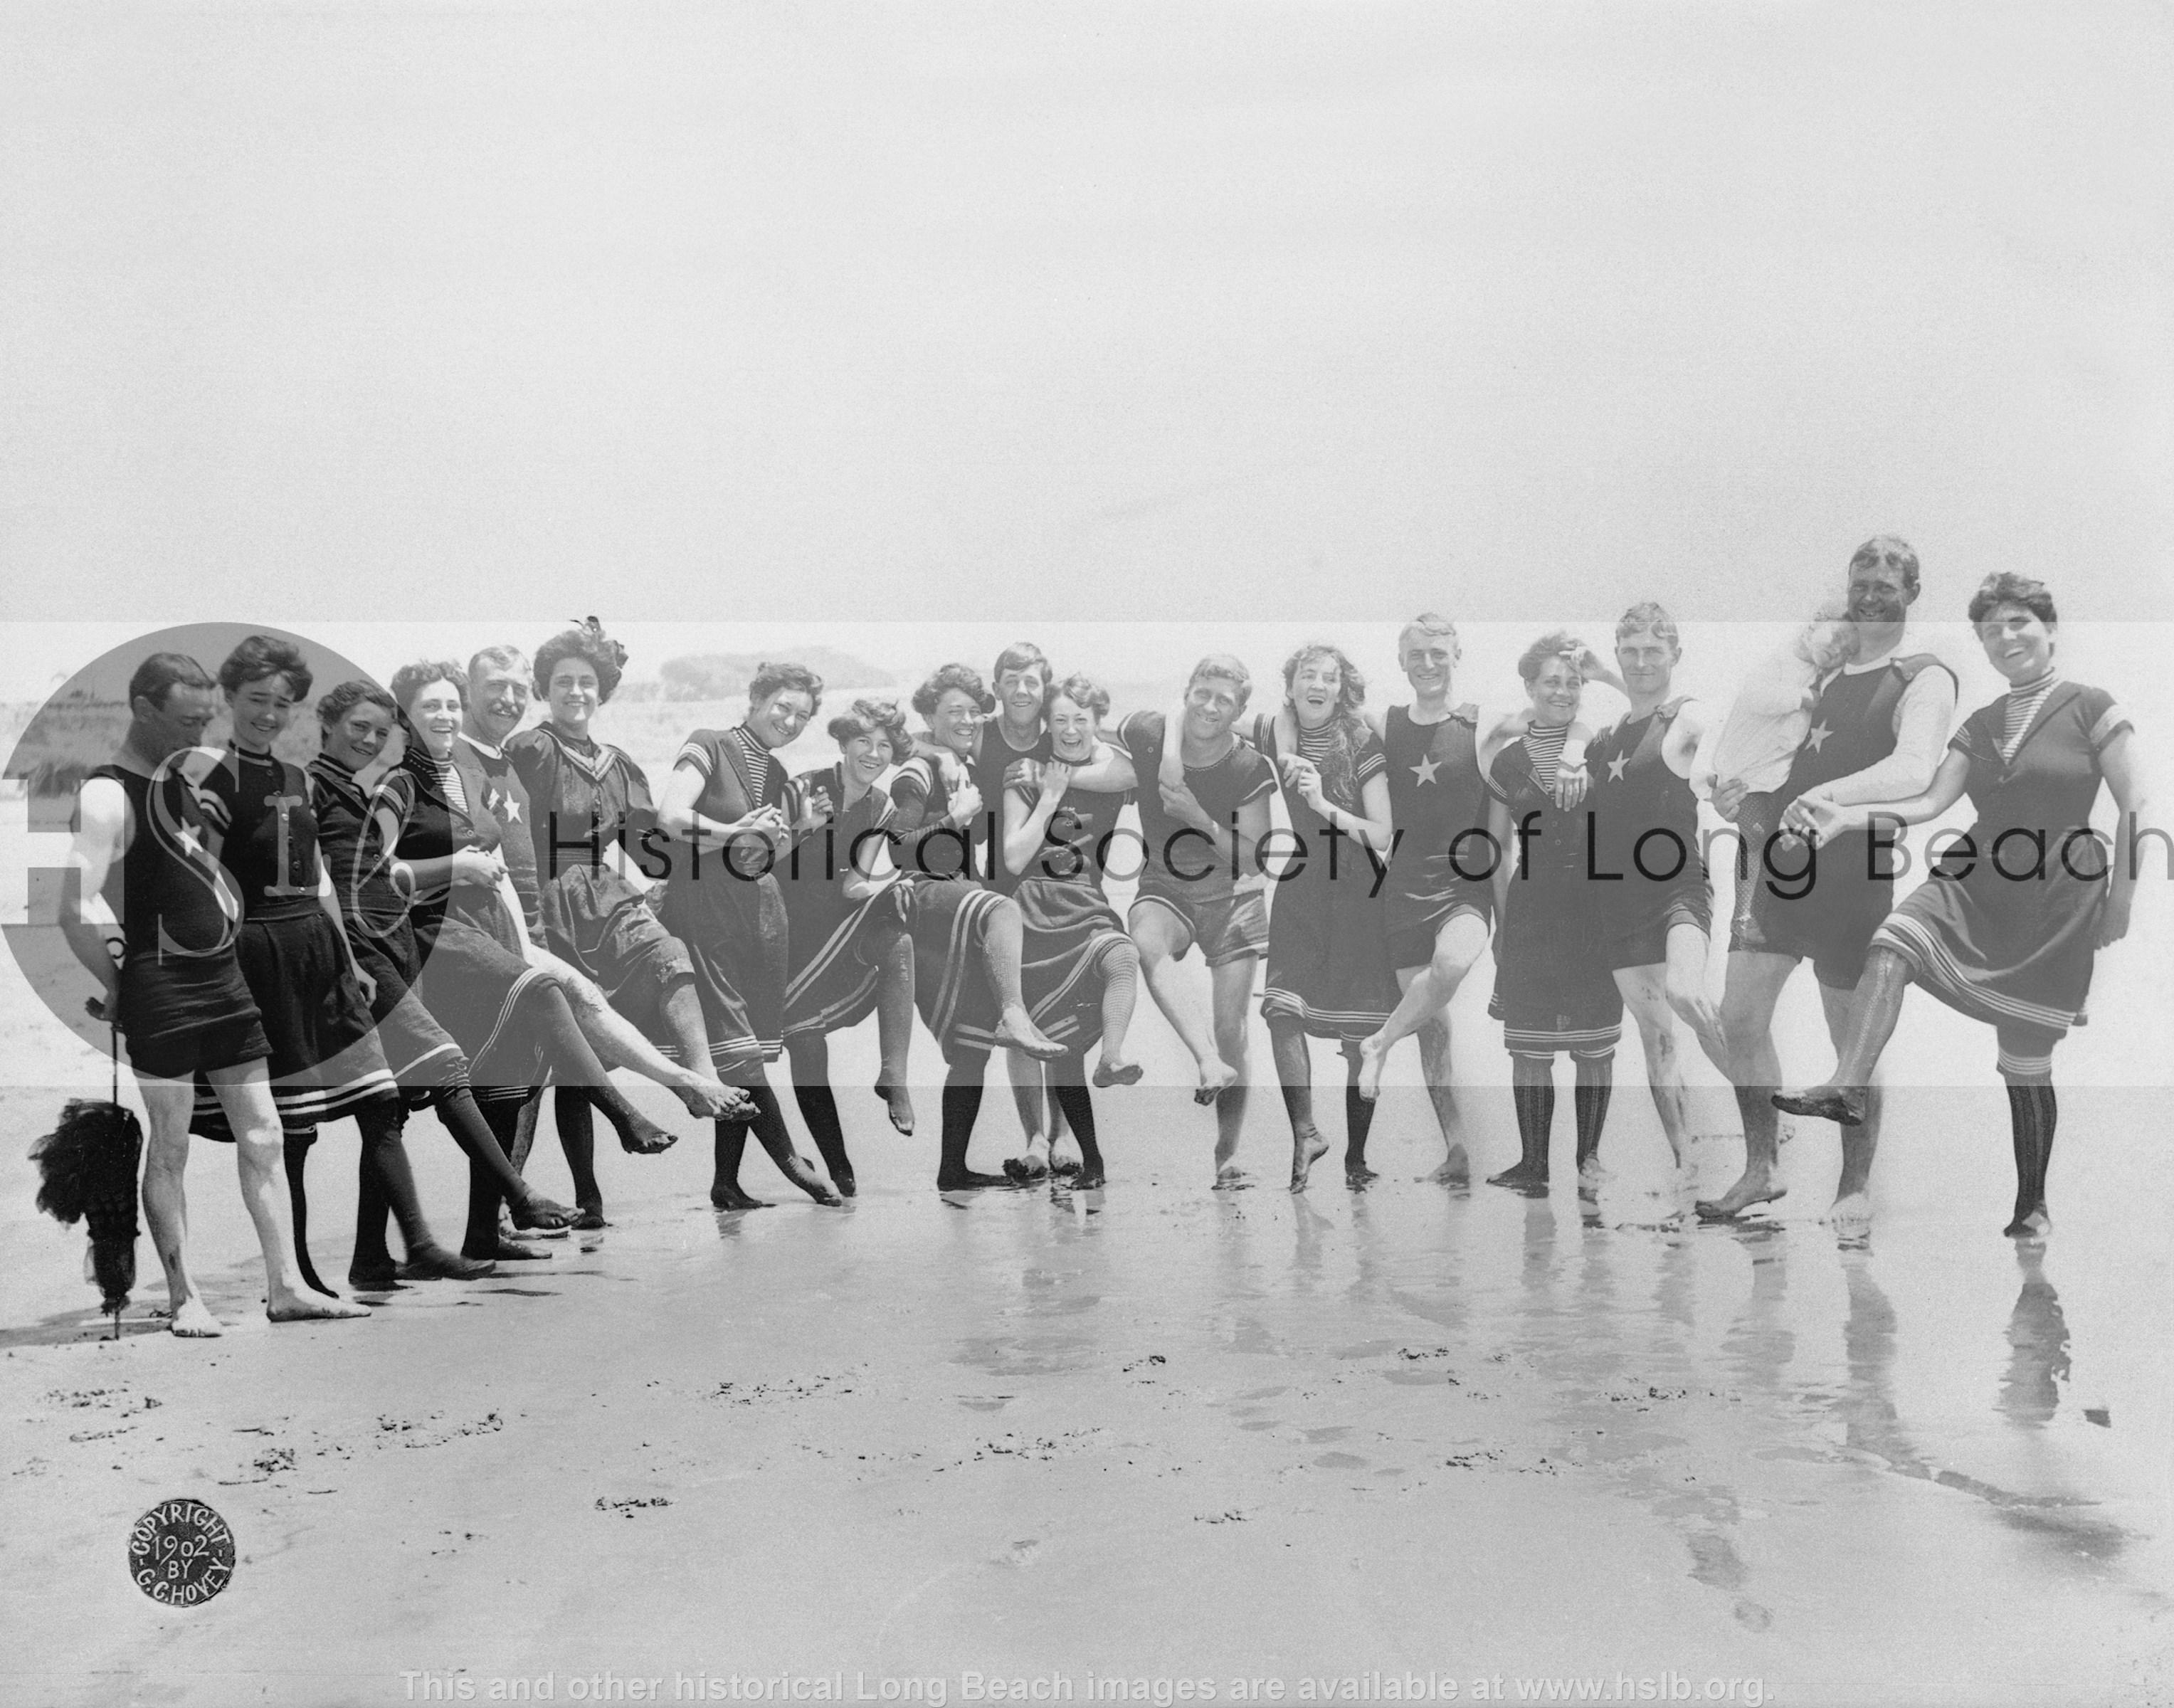 Bathers on beach, c. 1902